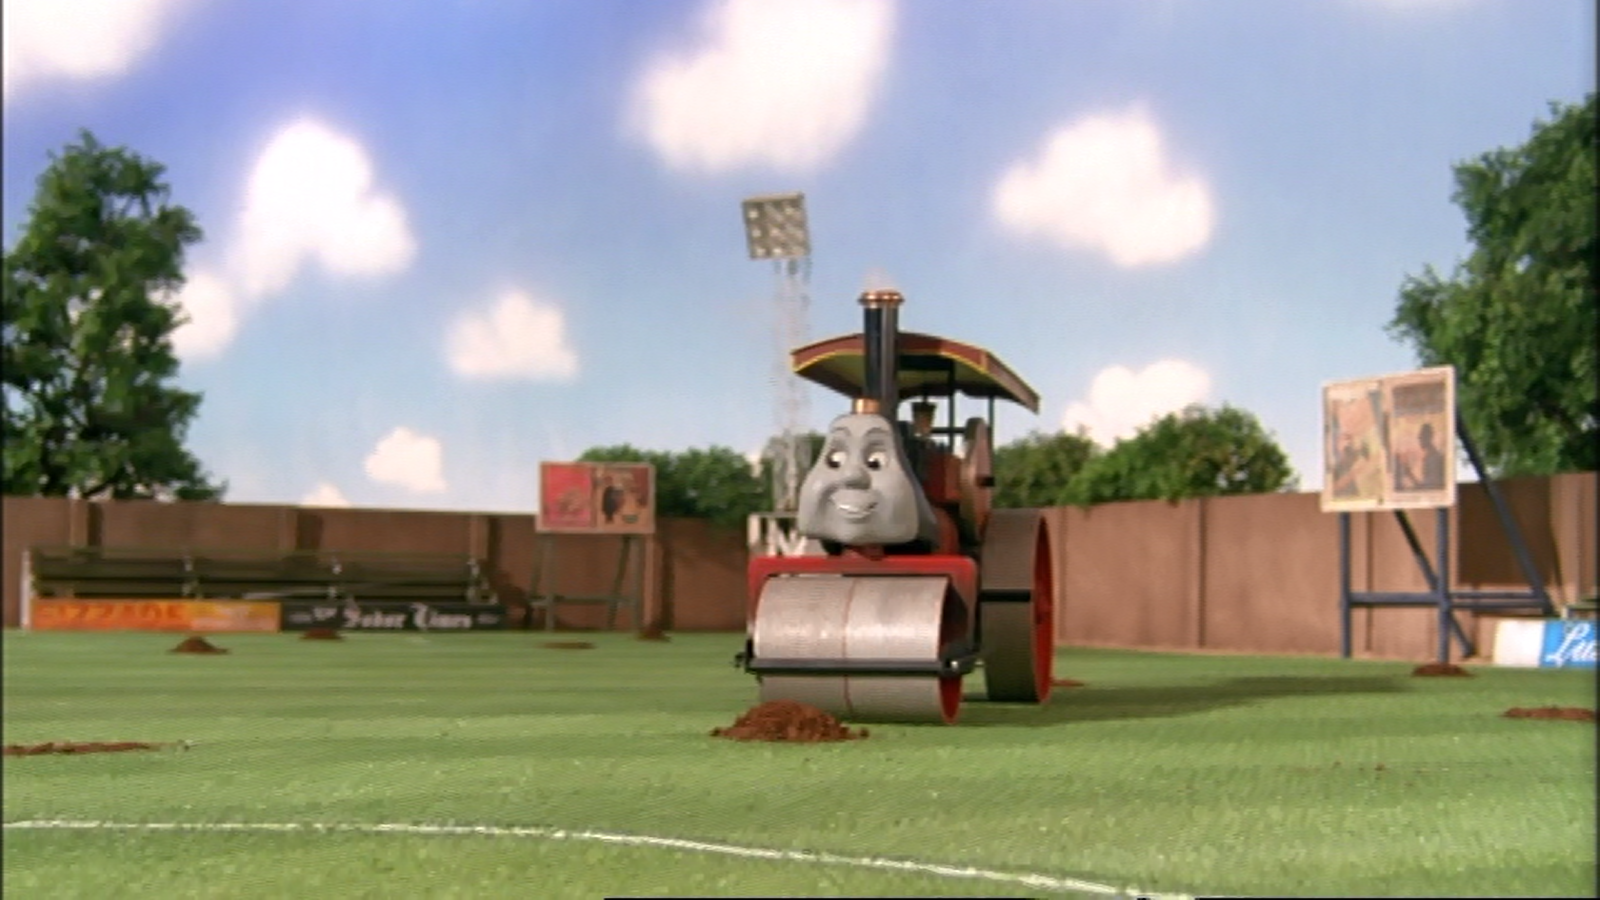 Thomas and the Moles